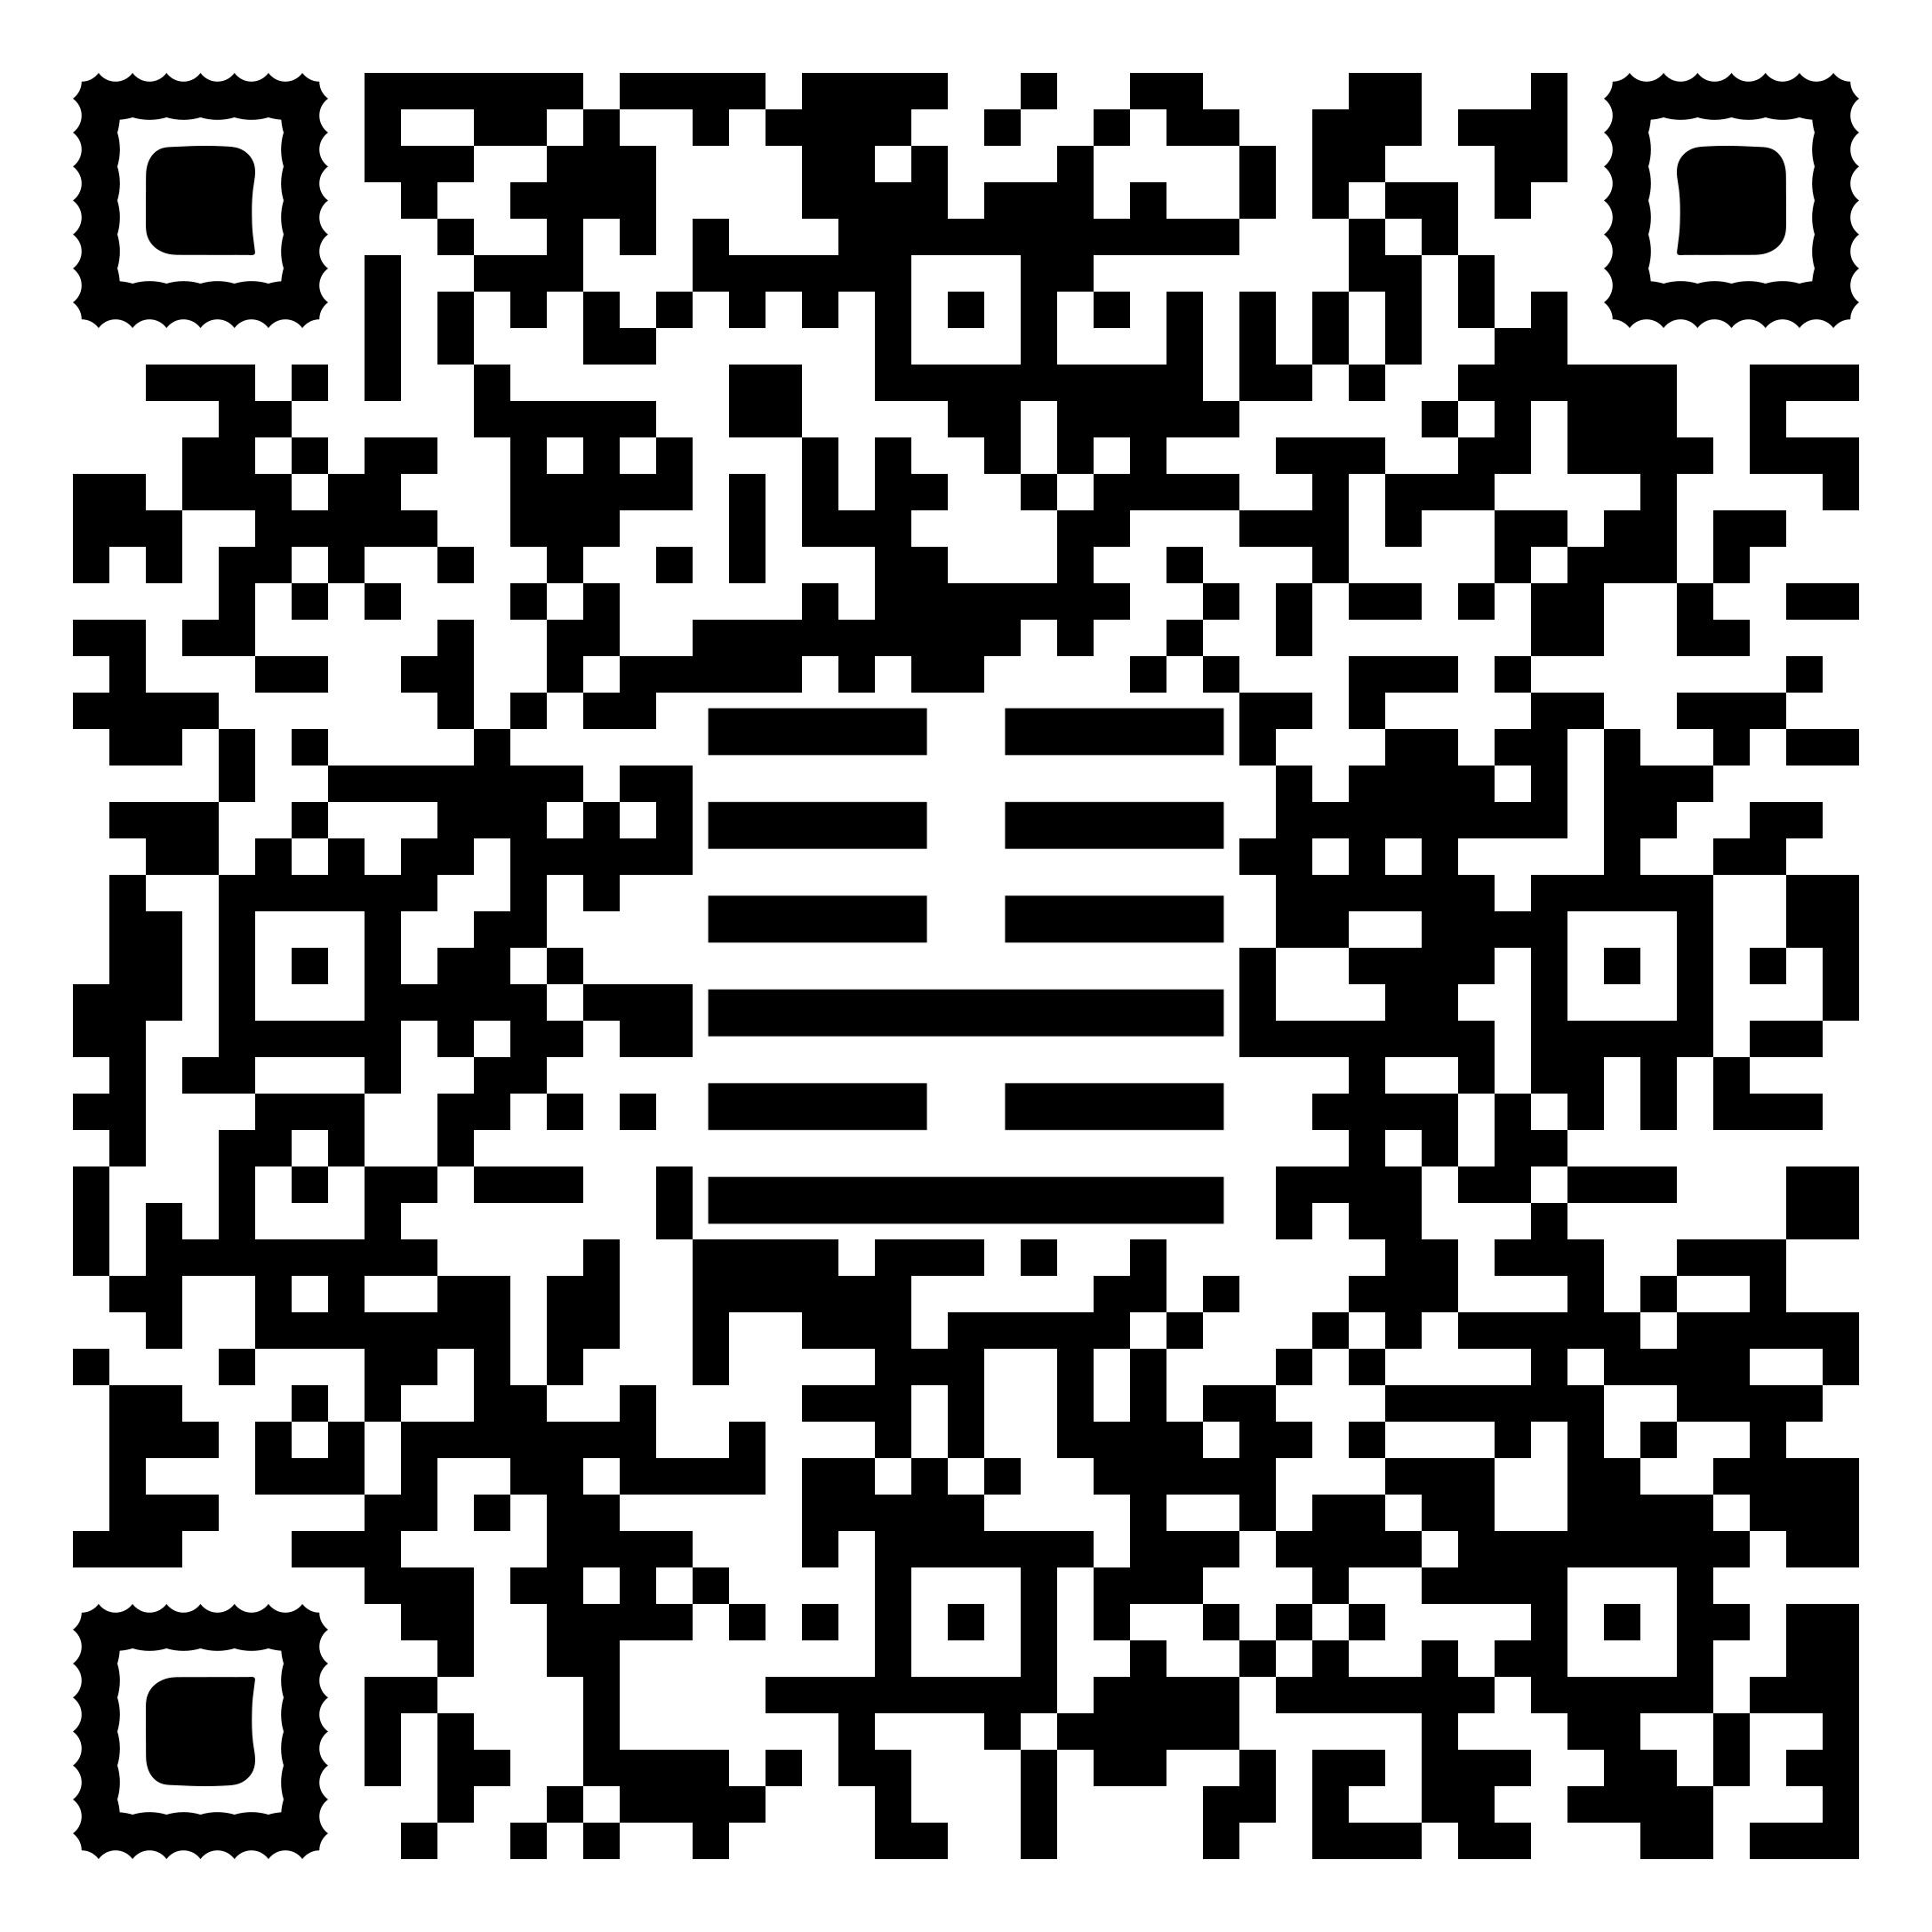 qr-code-36.png